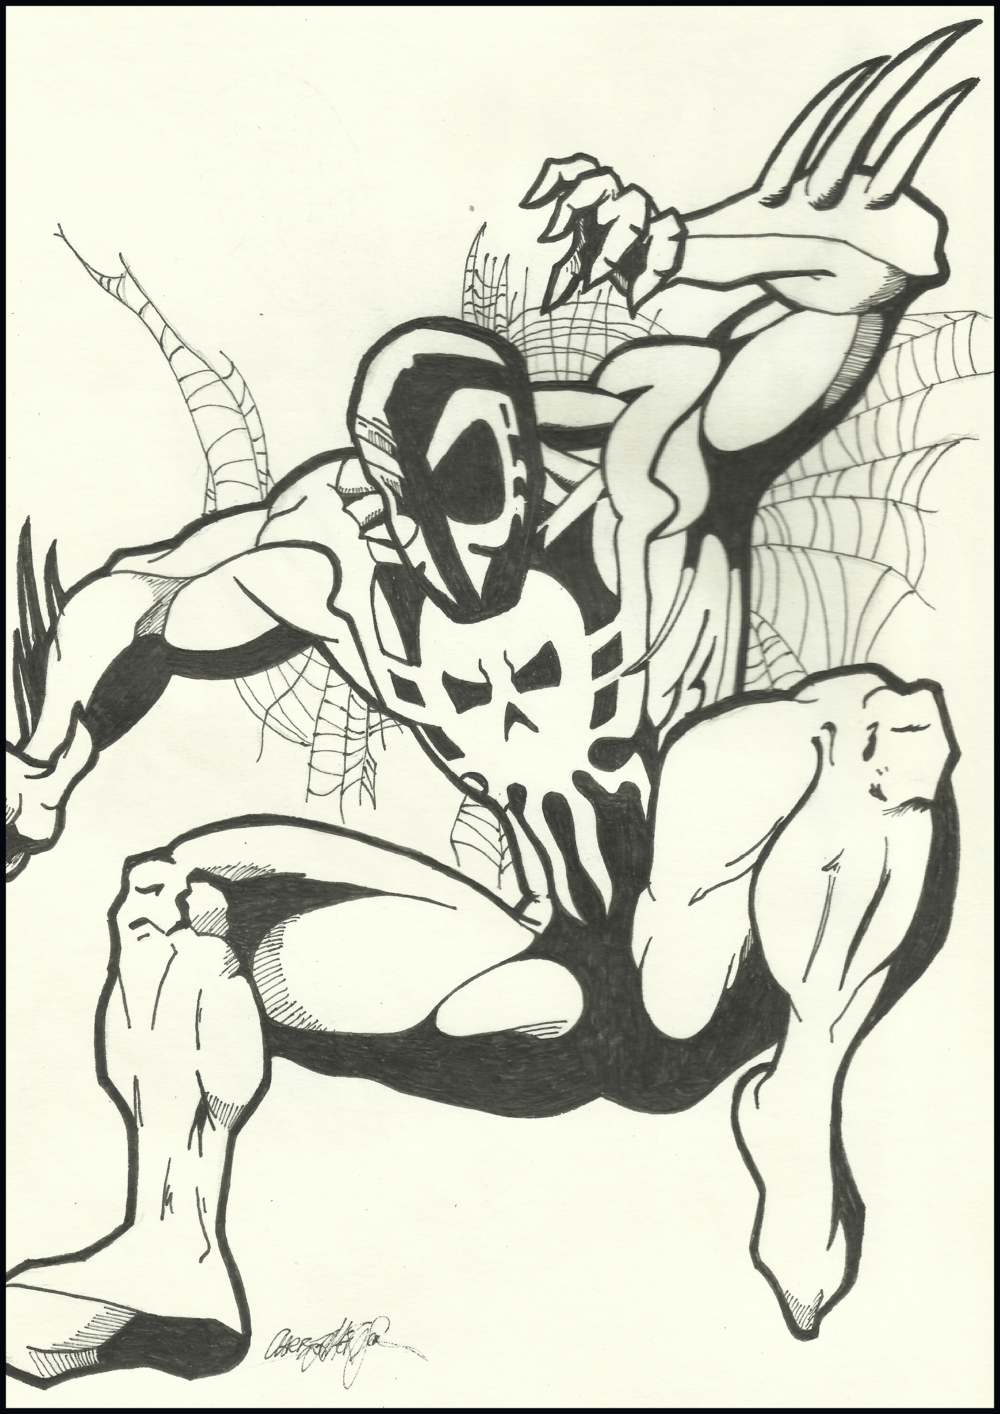 spidey2099-sketch.png